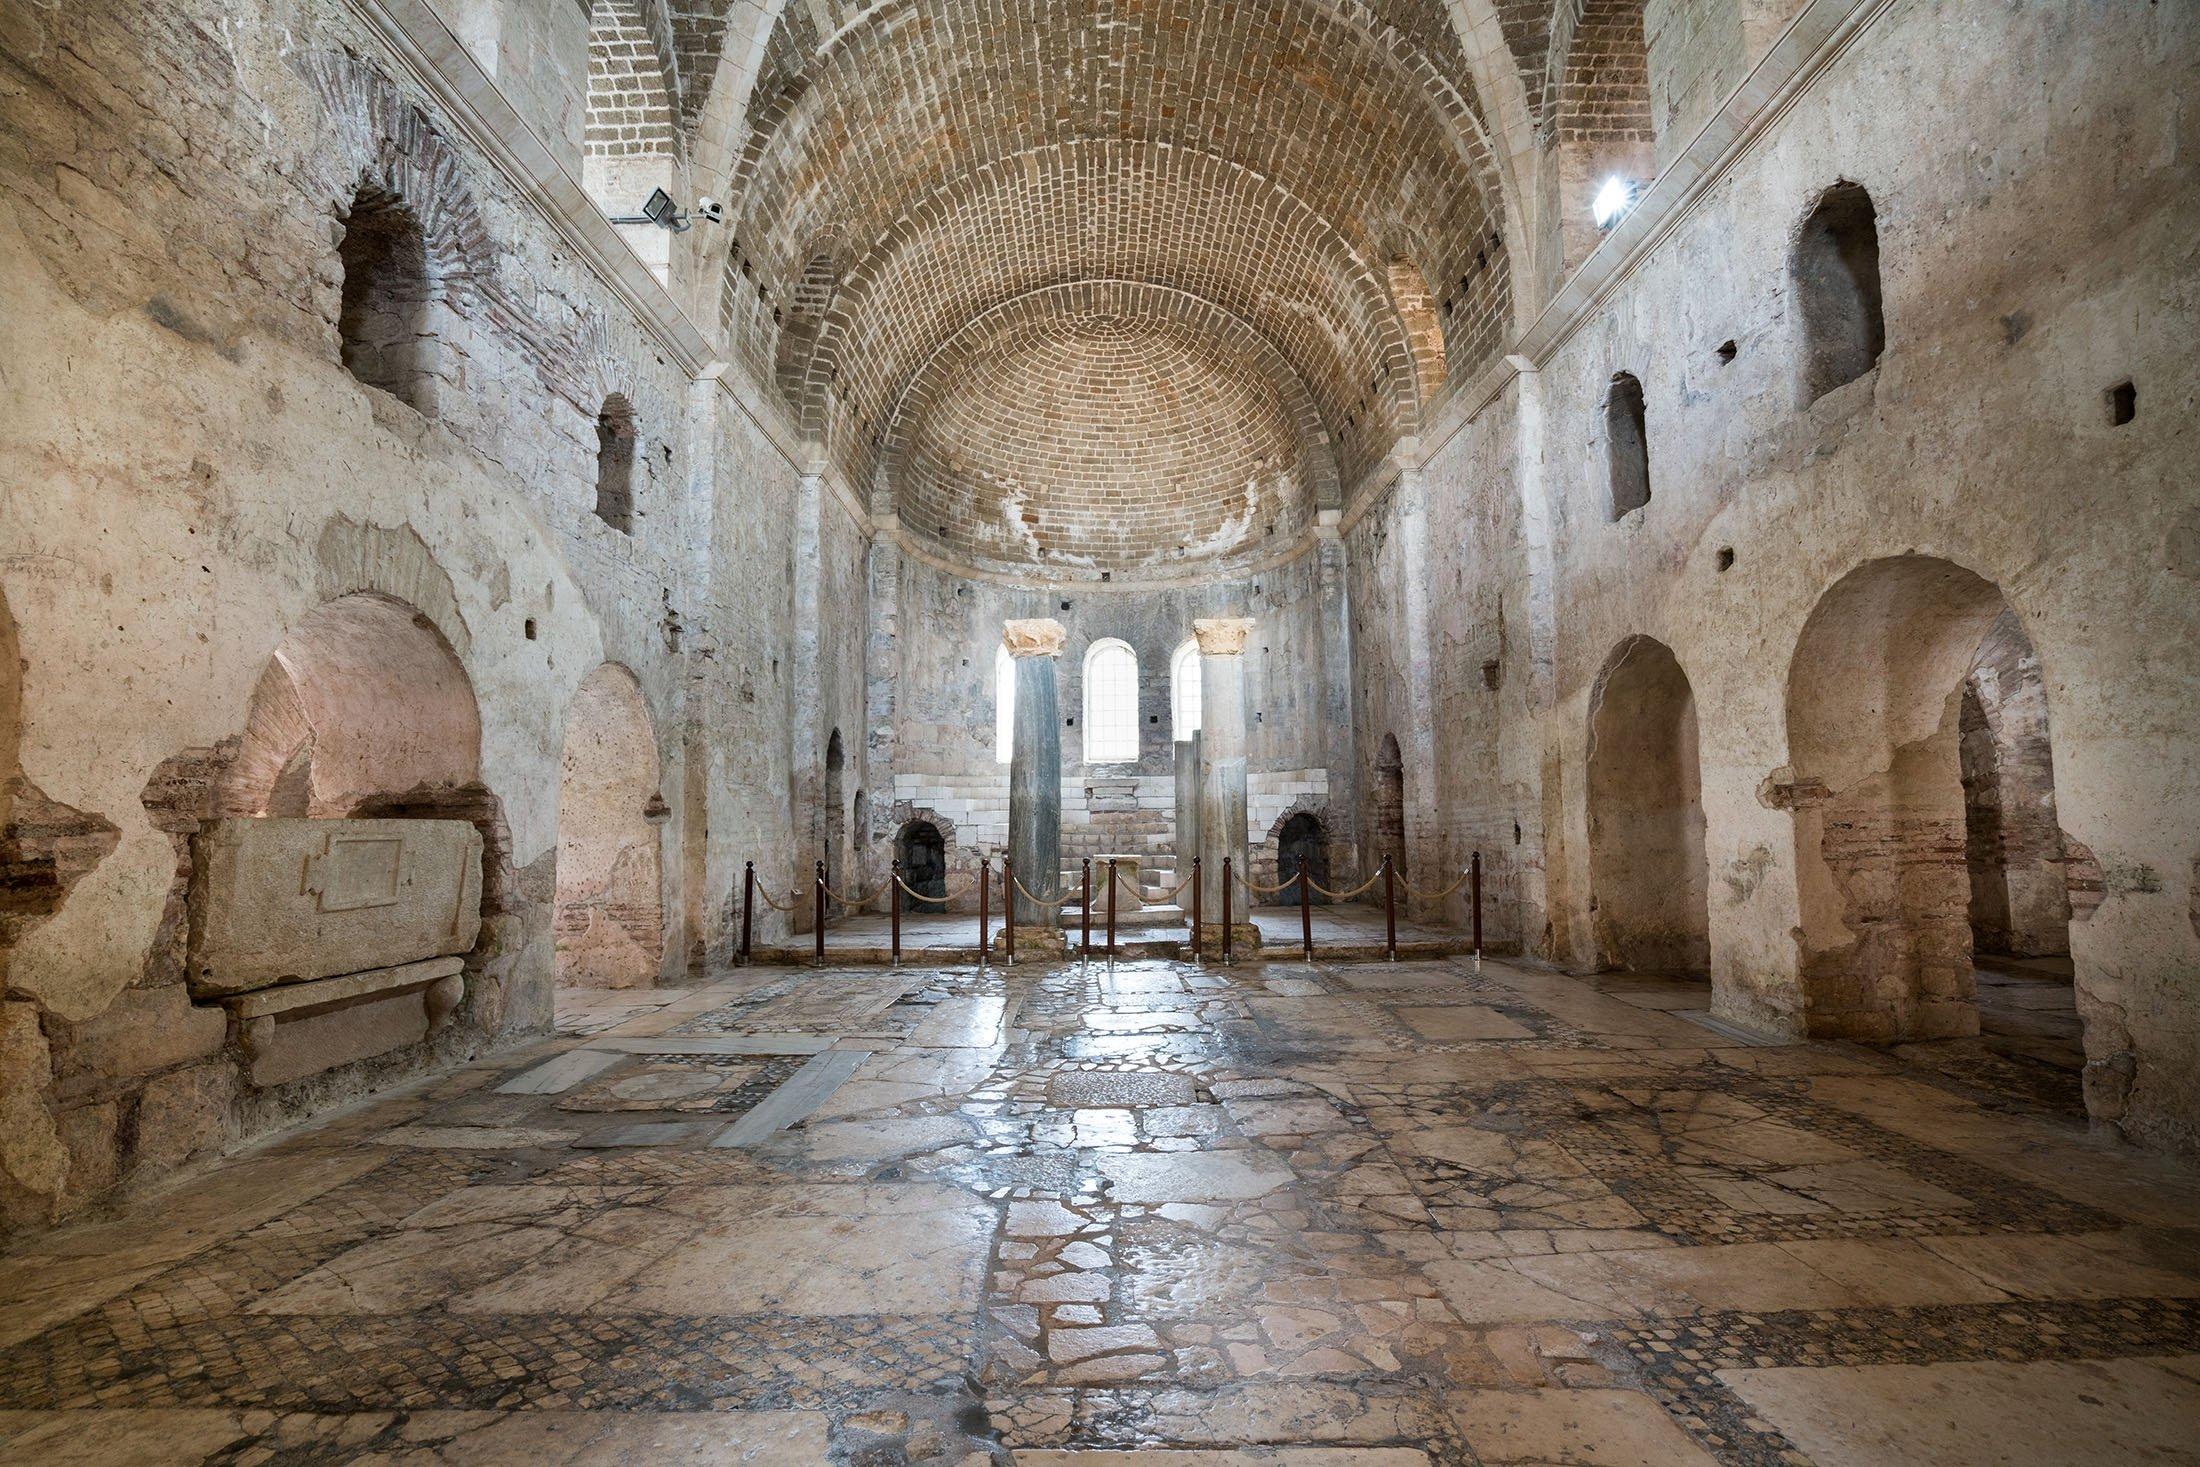 The interior of the St. Nicholas Church in Antalya, southern Turkey, November 12, 2016. (Shutterstock Photo)